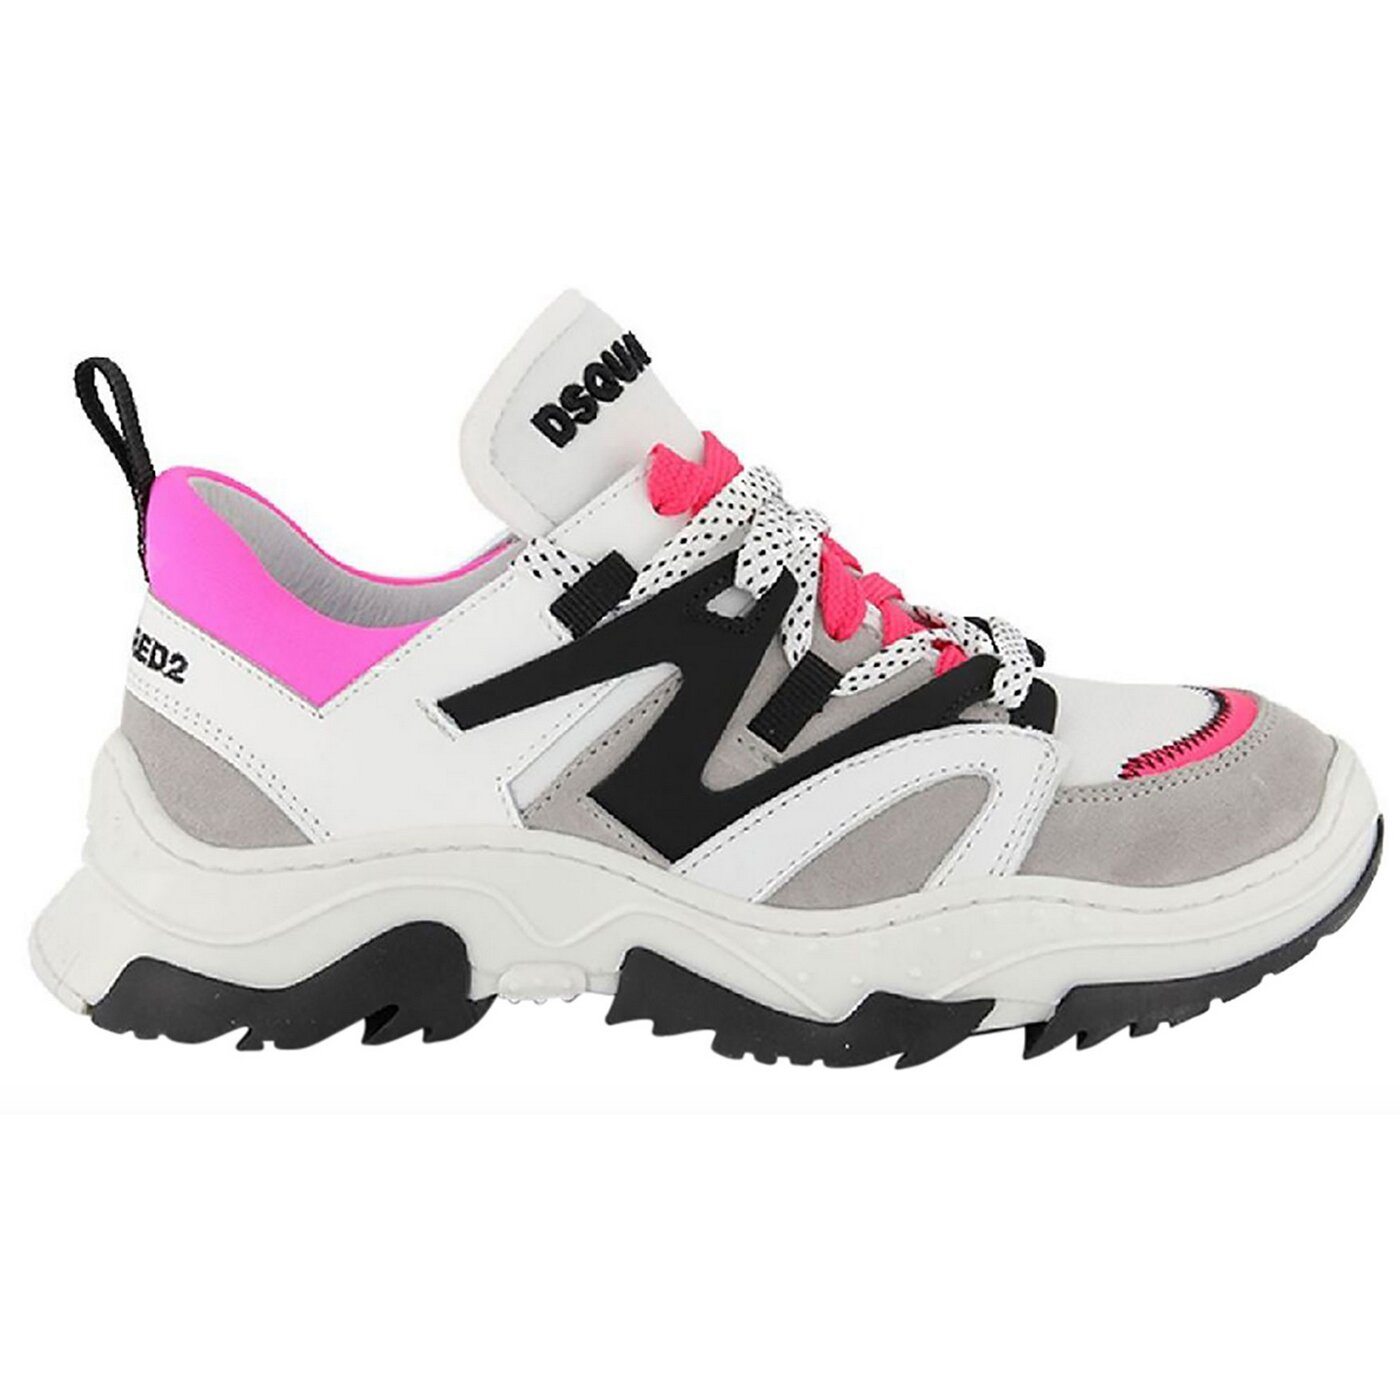 Dsquared2 schoenen wit fluo 67081